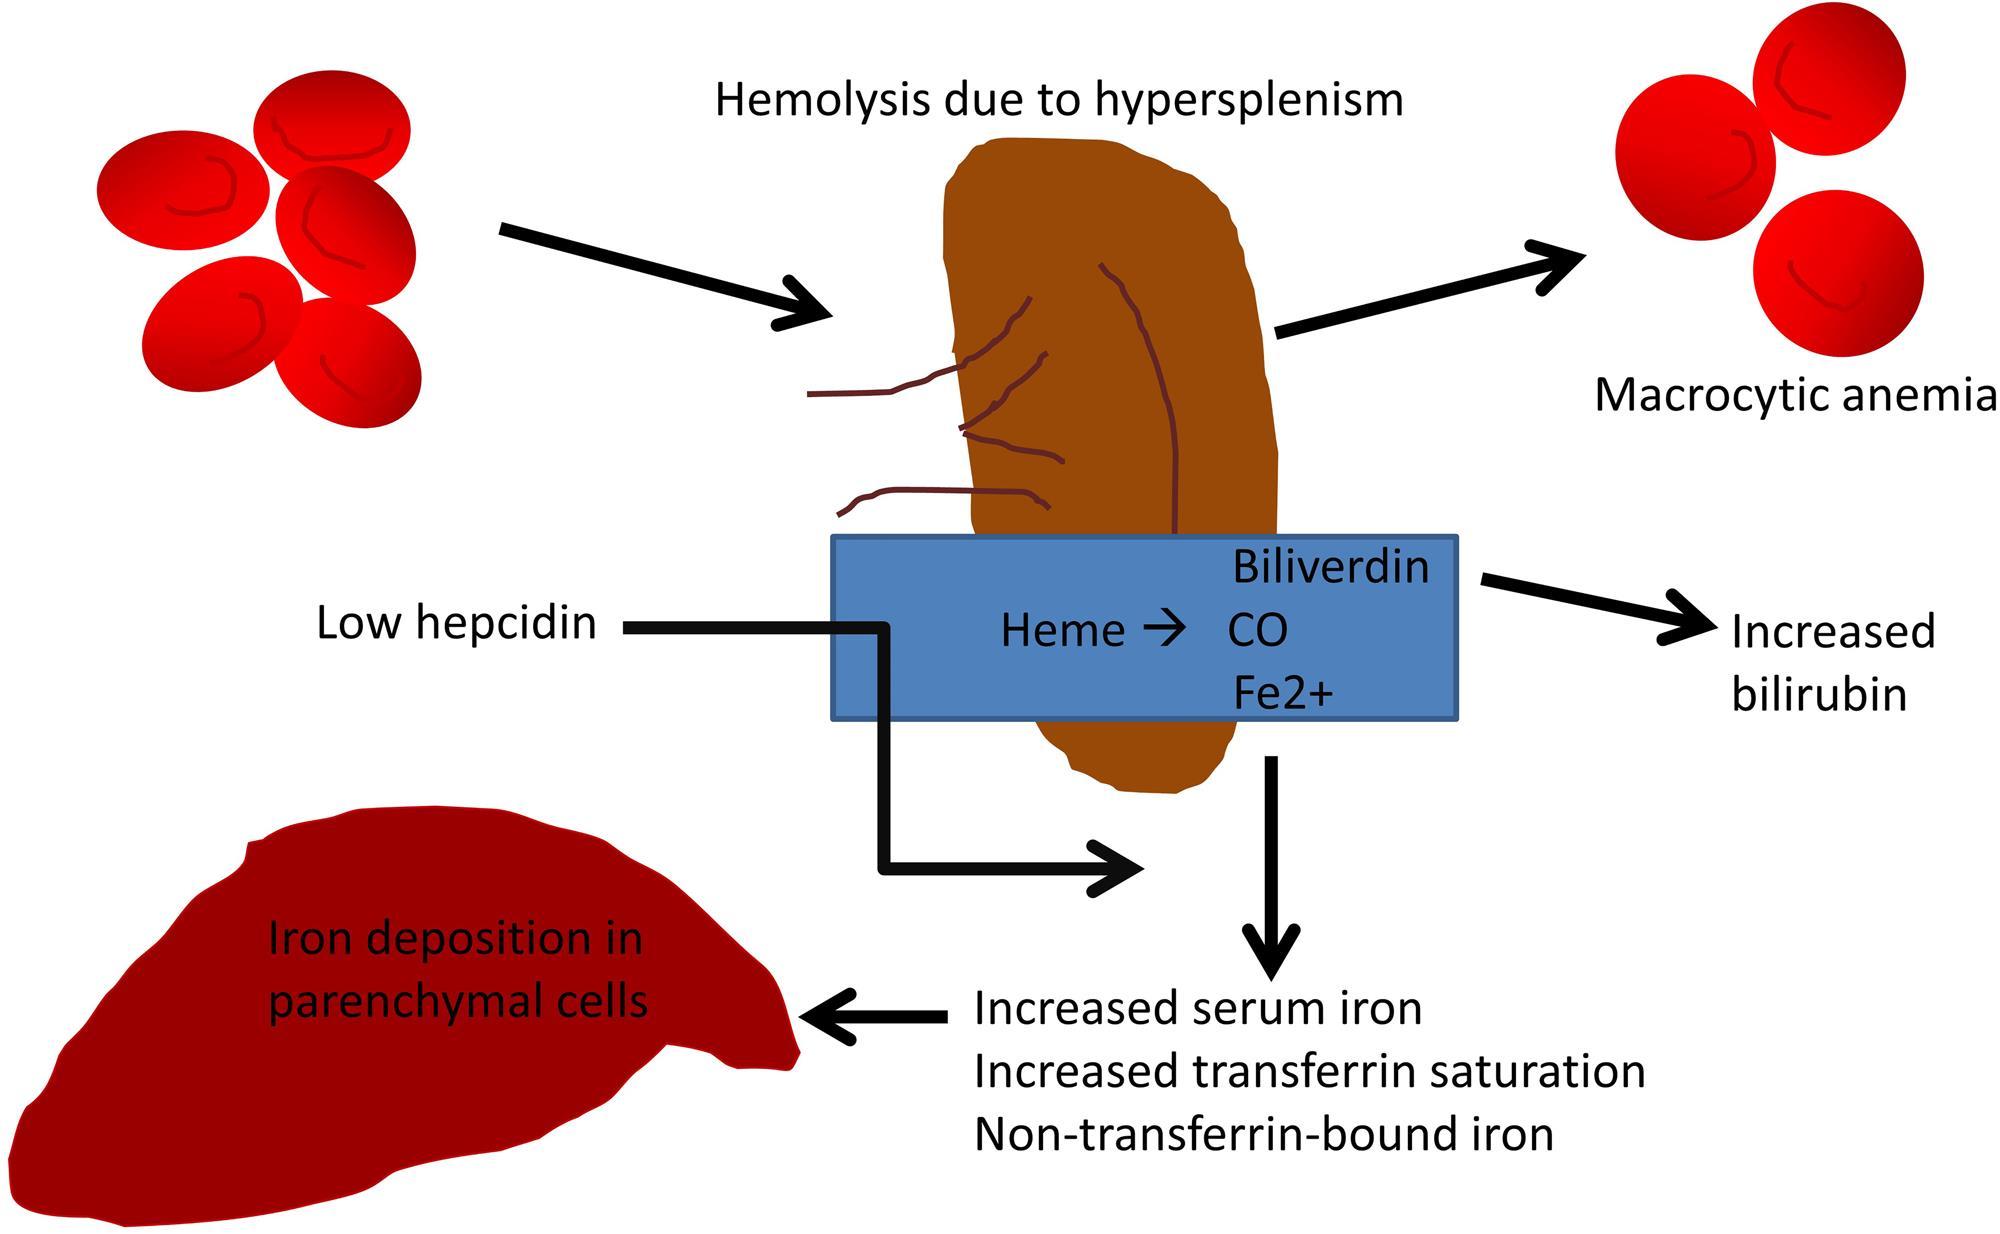 Hypothetical schema linking extravascular hemolysis to parenchymal iron deposition in cirrhotic livers.